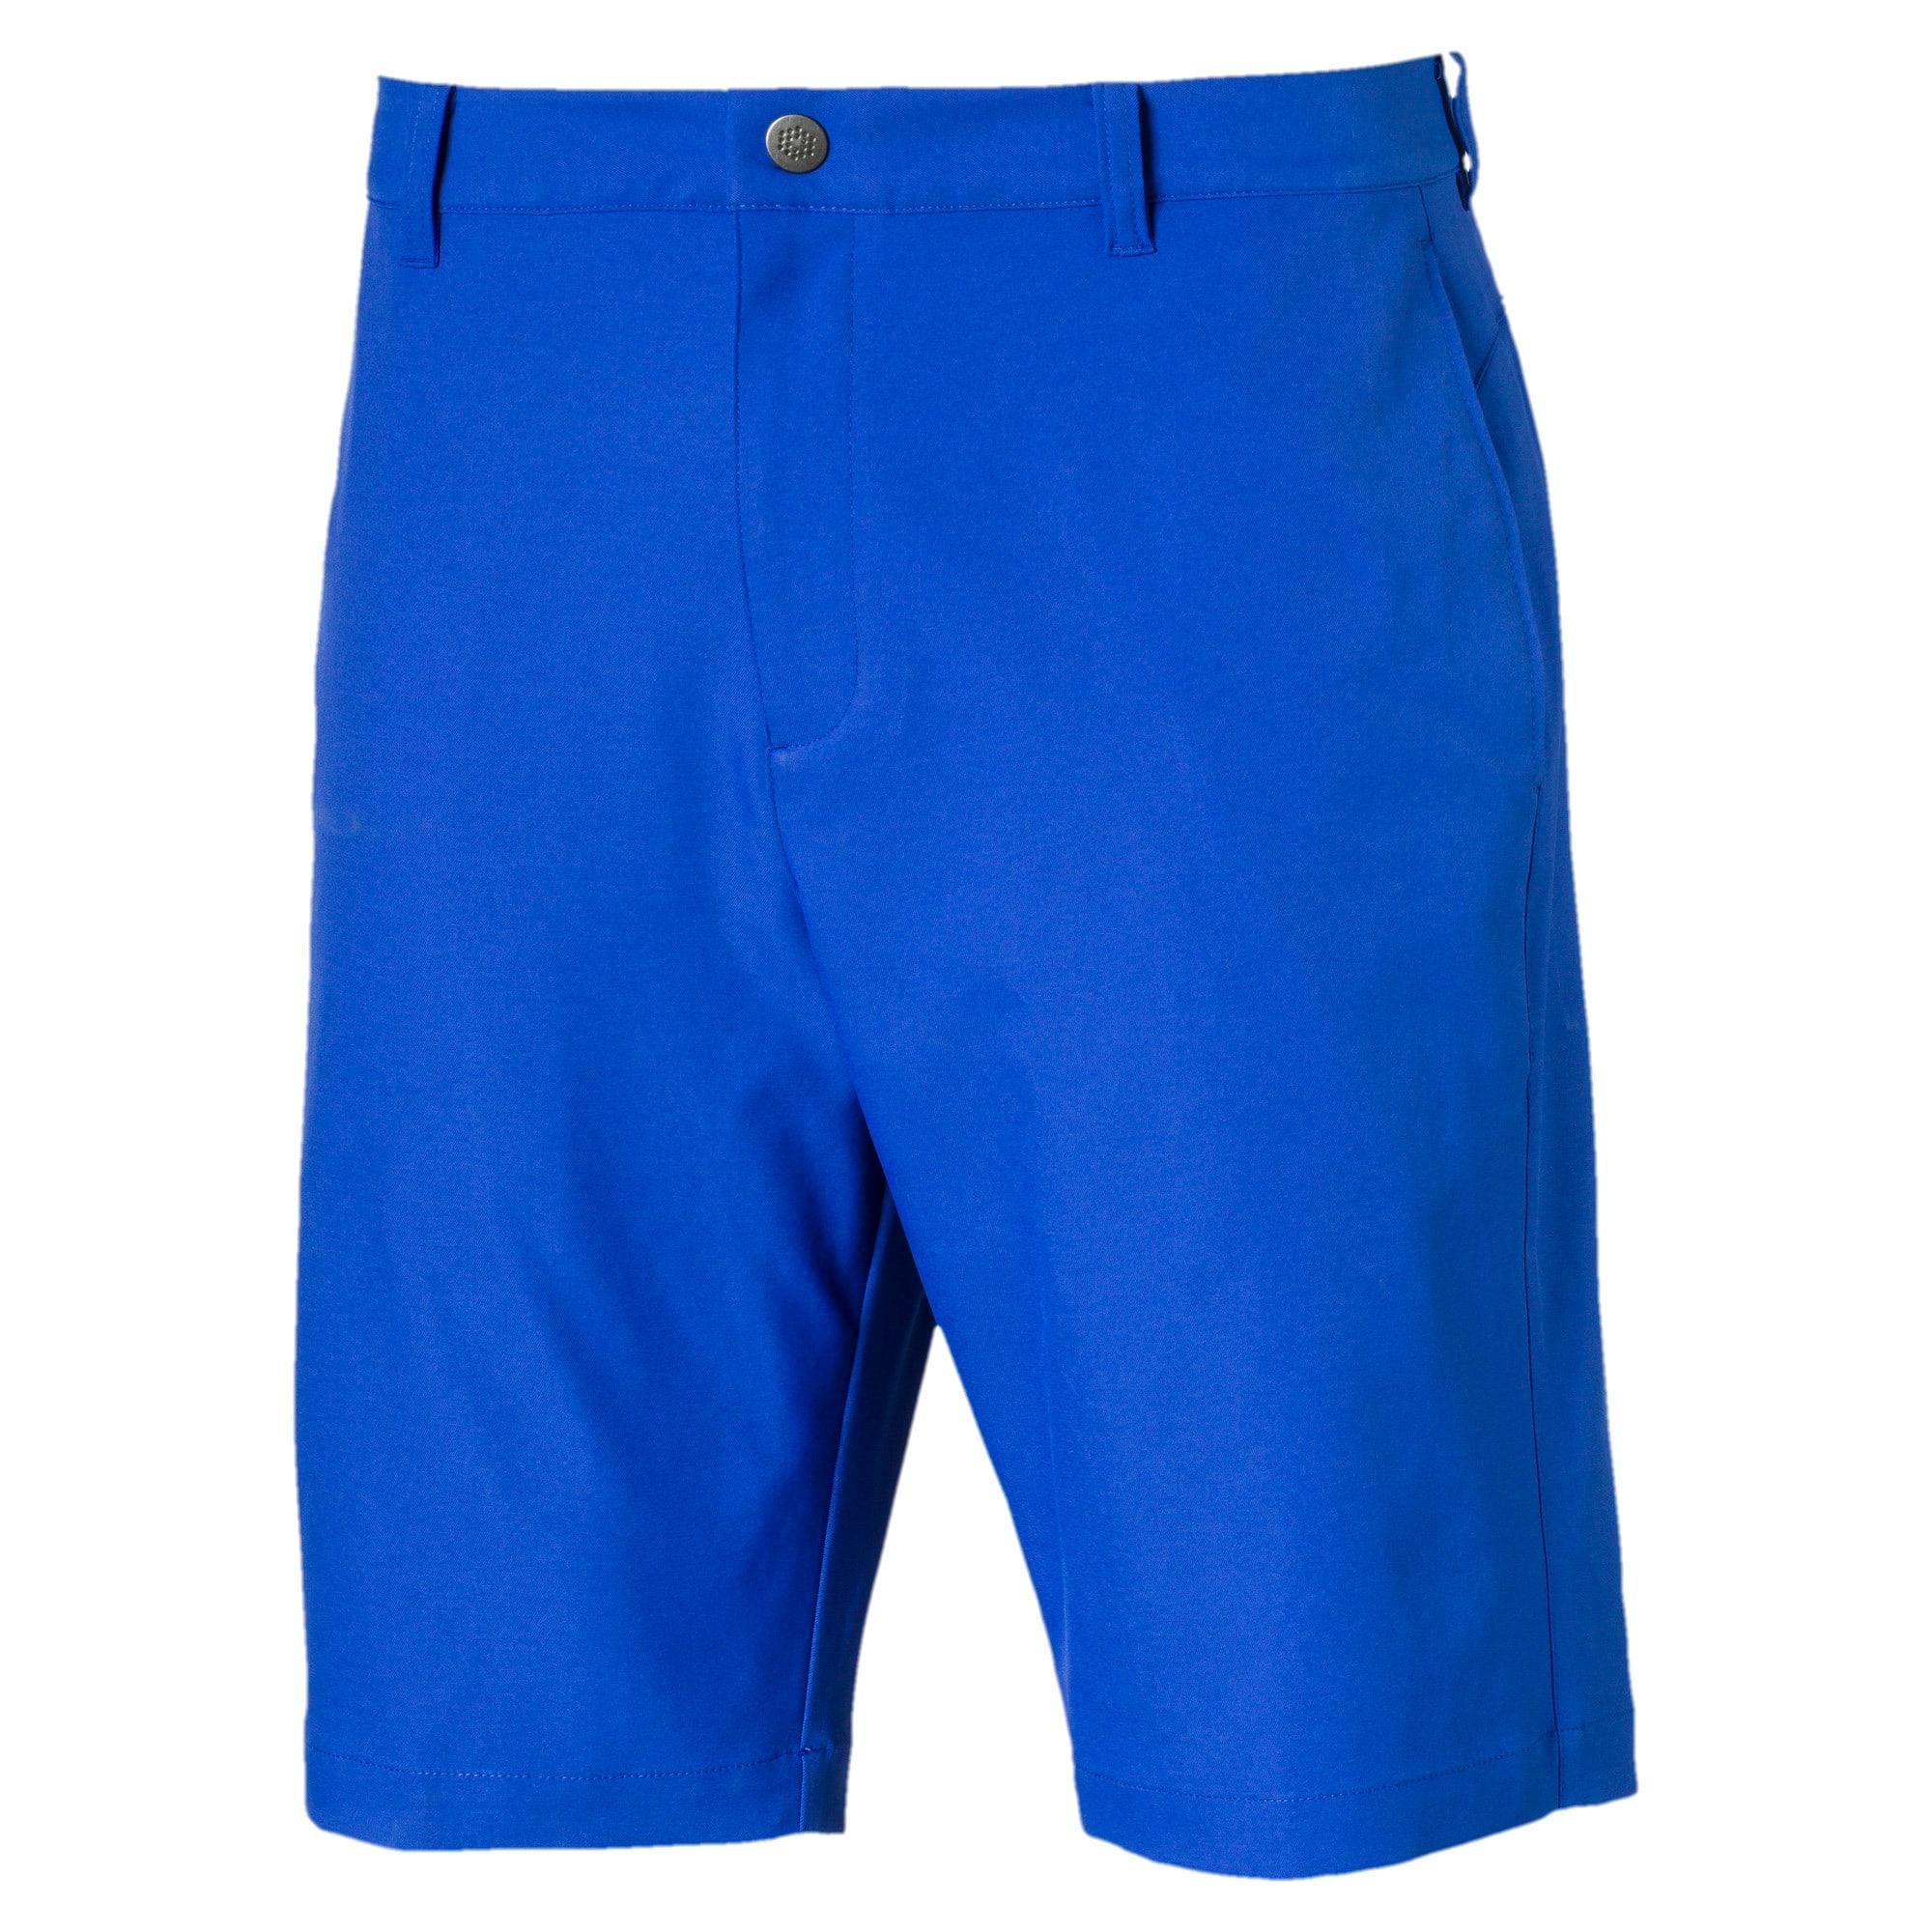 Thumbnail 1 of Jackpot Men's Shorts, Dazzling Blue, medium